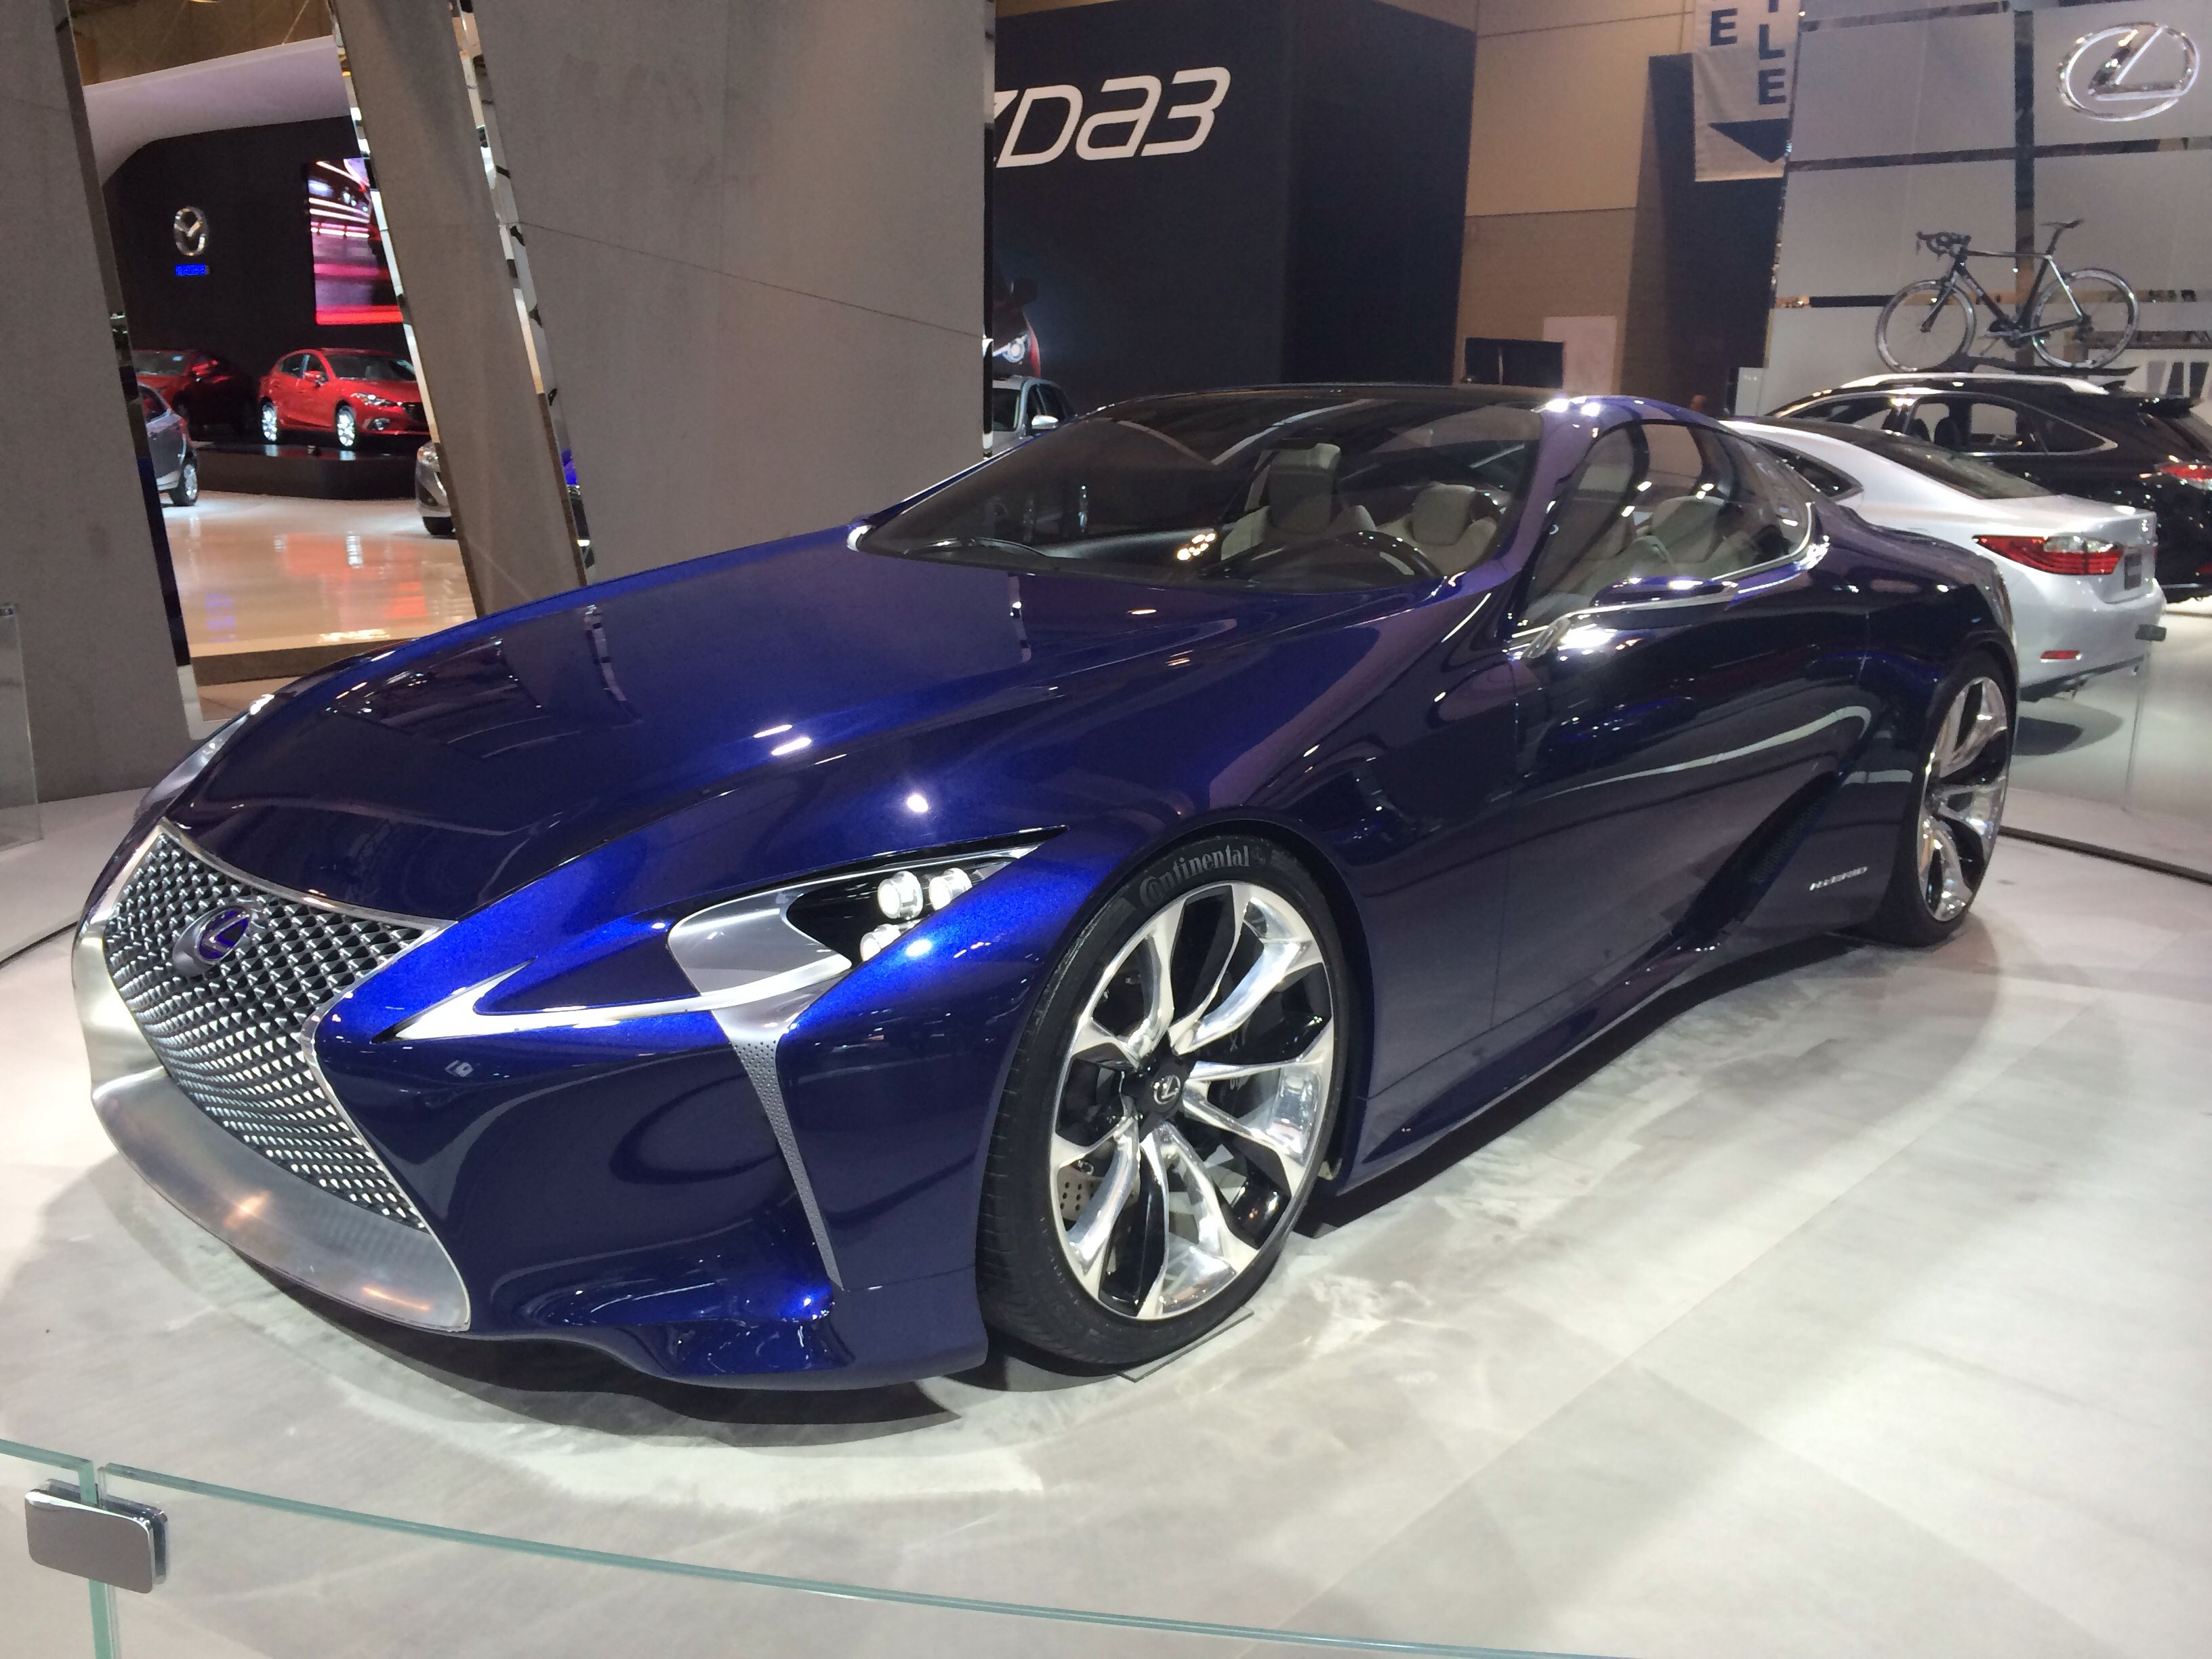 LF-LC at the 2014 Canadian International Auto Show, Toronto #lexus #lexussalespro #lexuslove #2014CIAS #toronto